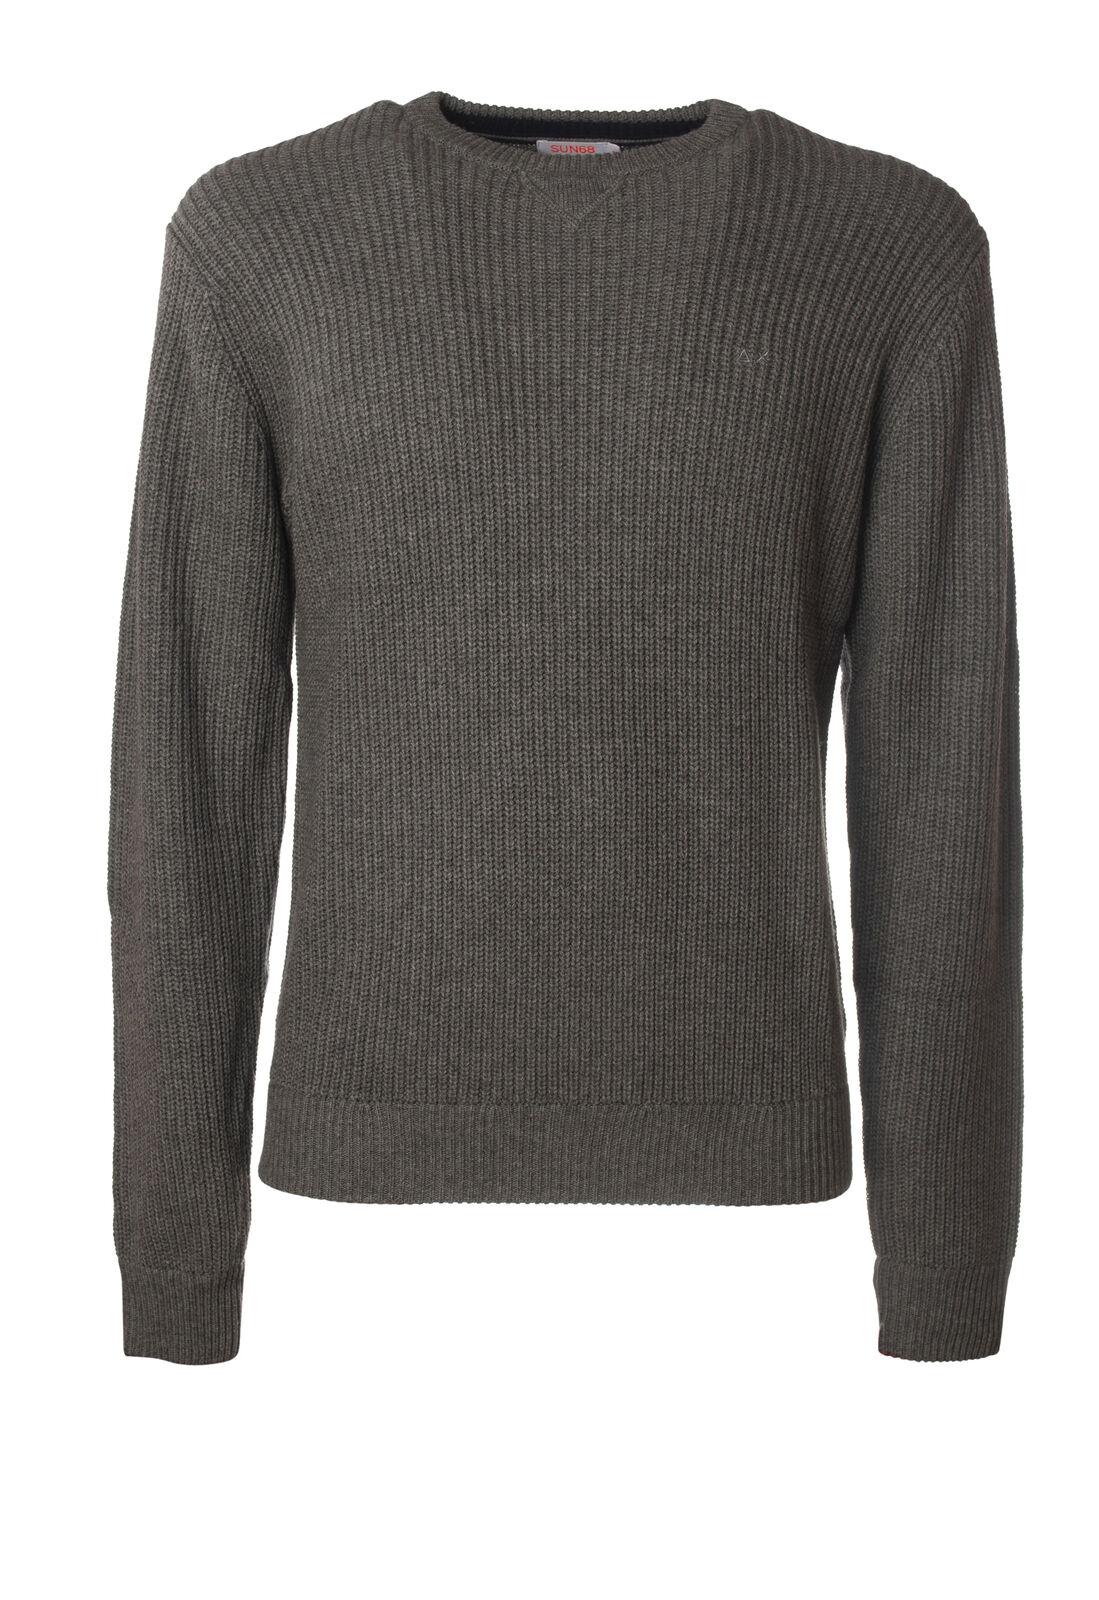 Sun 68 - Knitwear-Sweaters - Man - Grau - 5559926I184639